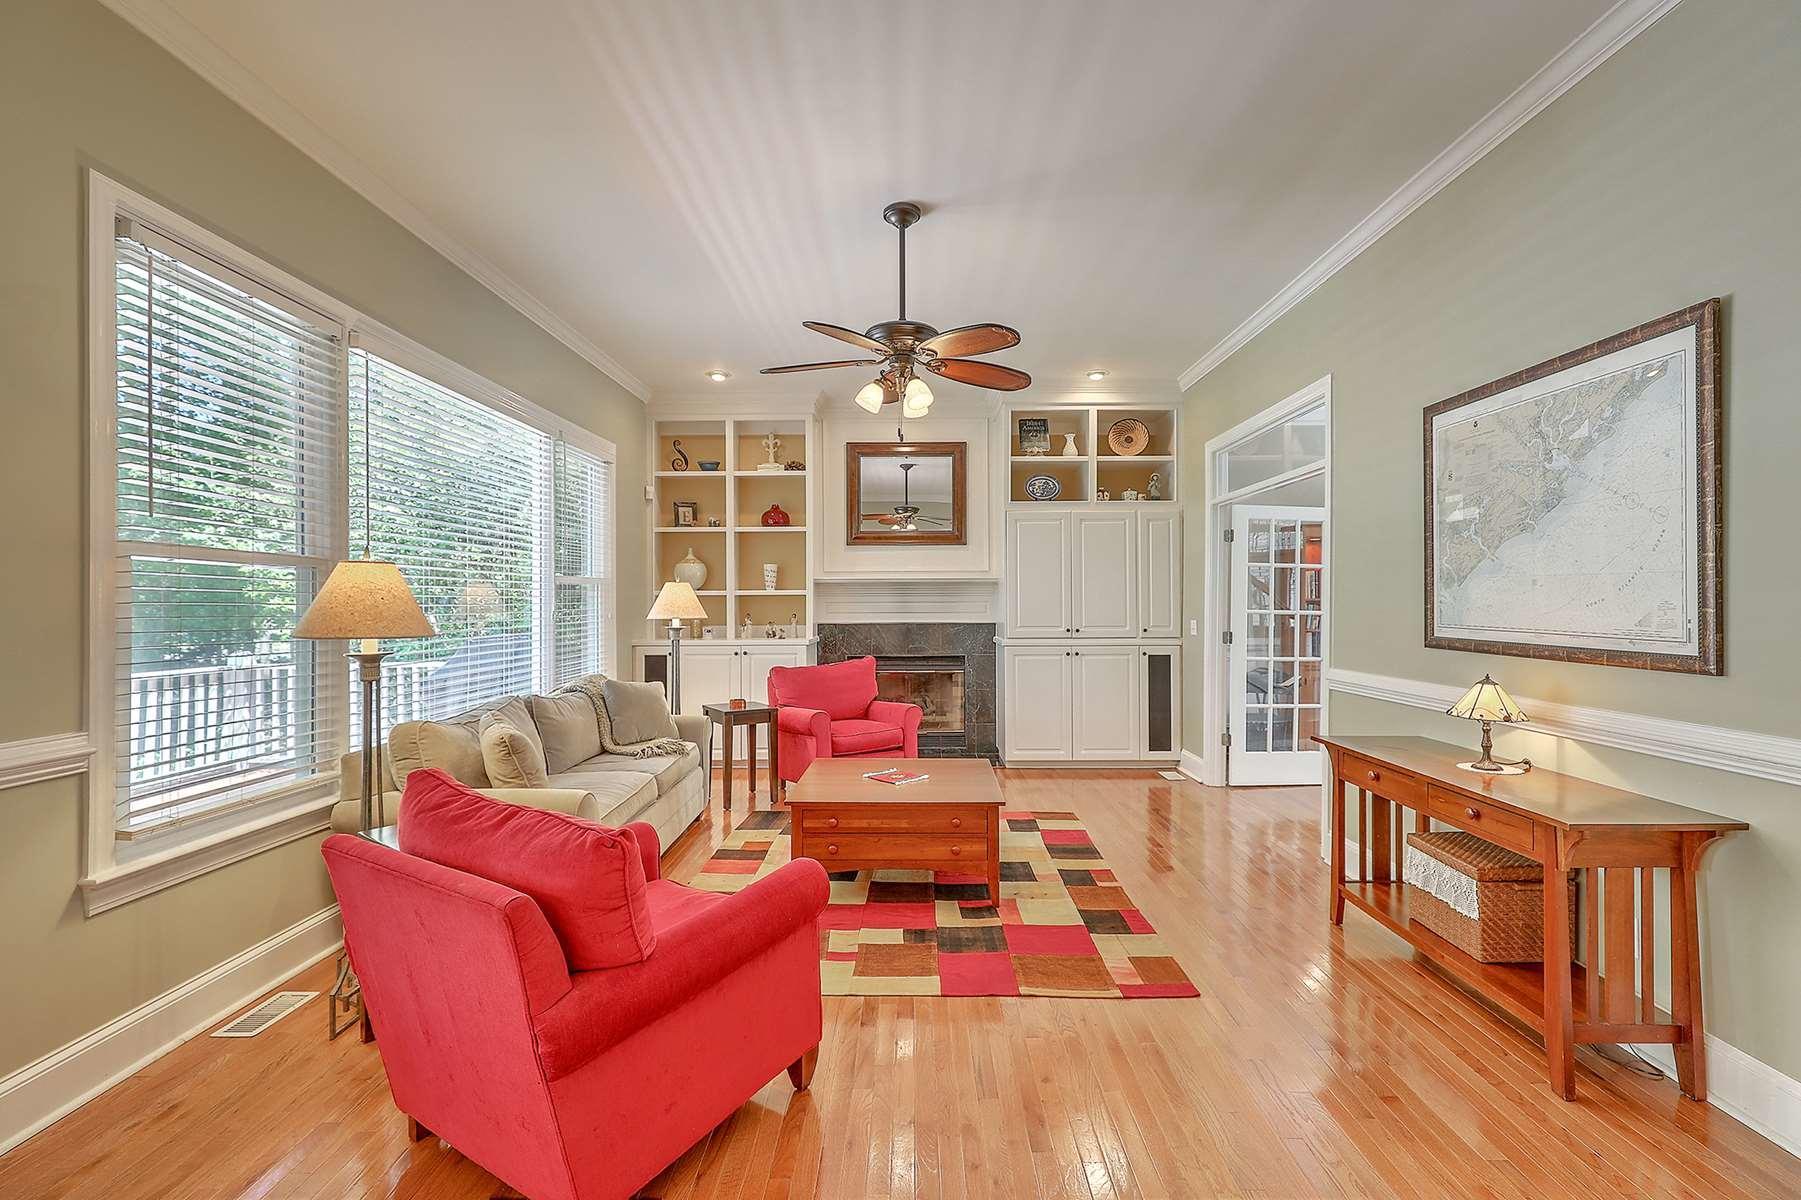 Dunes West Homes For Sale - 2961 Pignatelli, Mount Pleasant, SC - 3